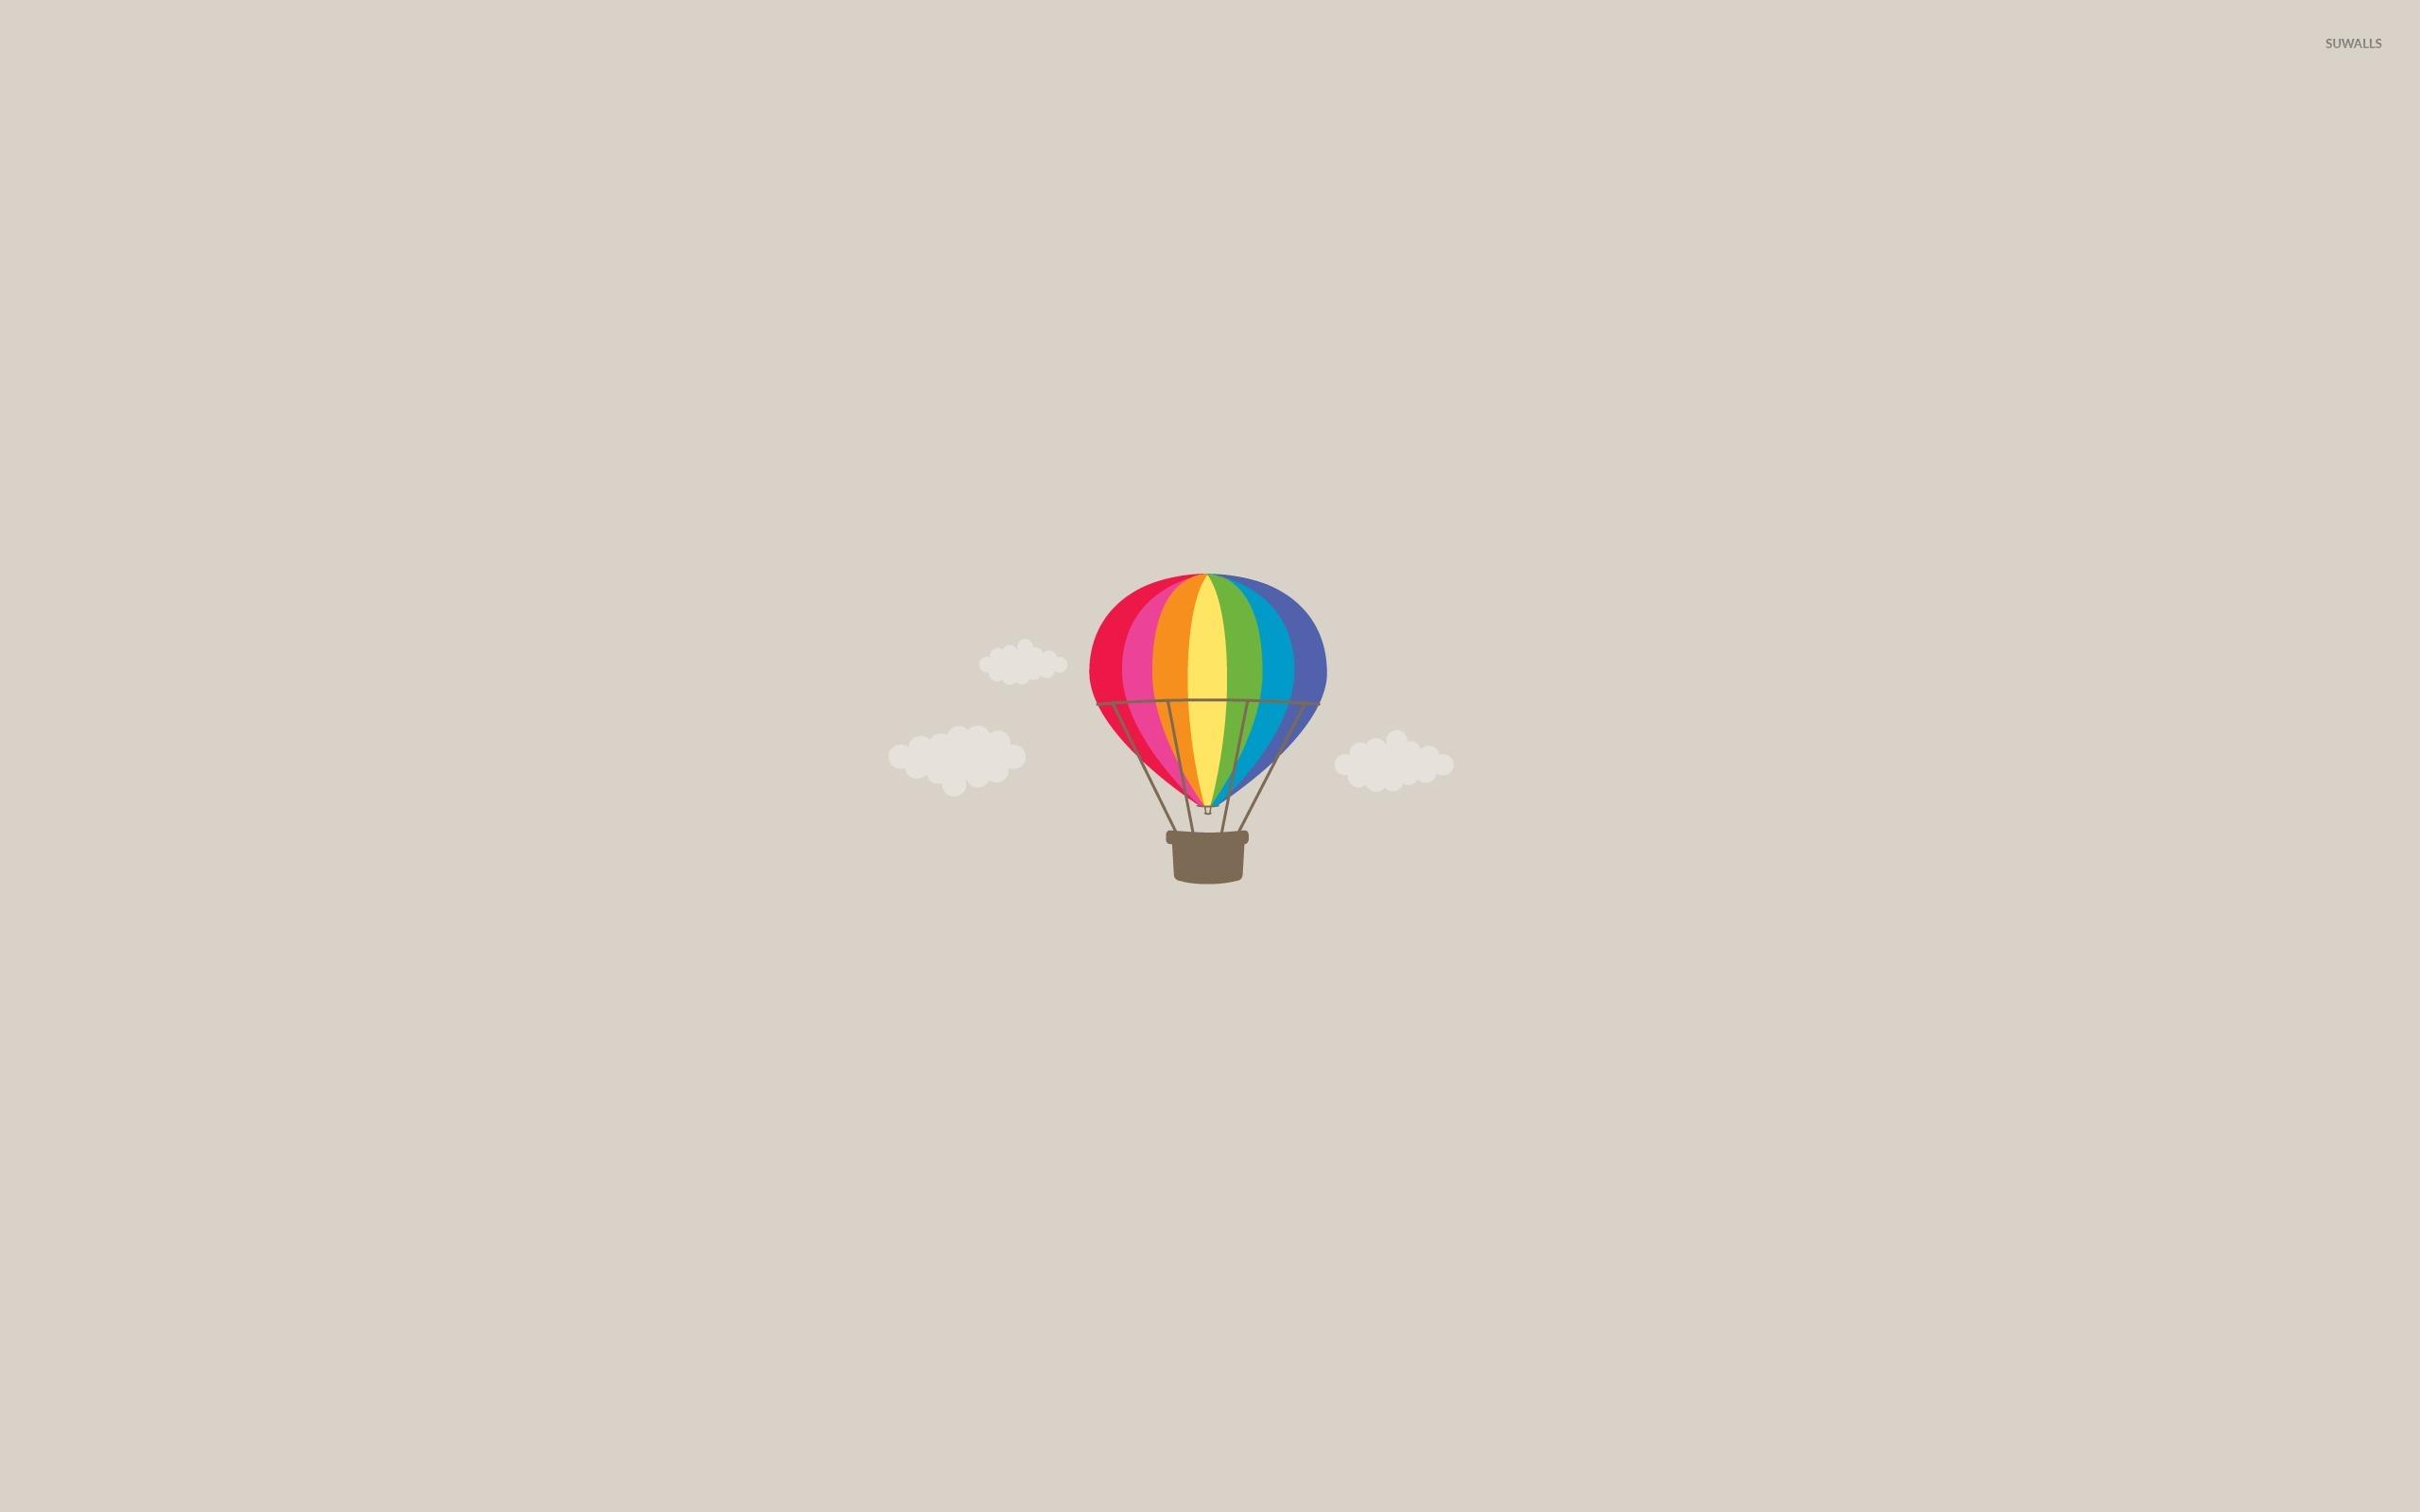 Hot Air Balloon Wallpaper Minimal - HD Wallpaper